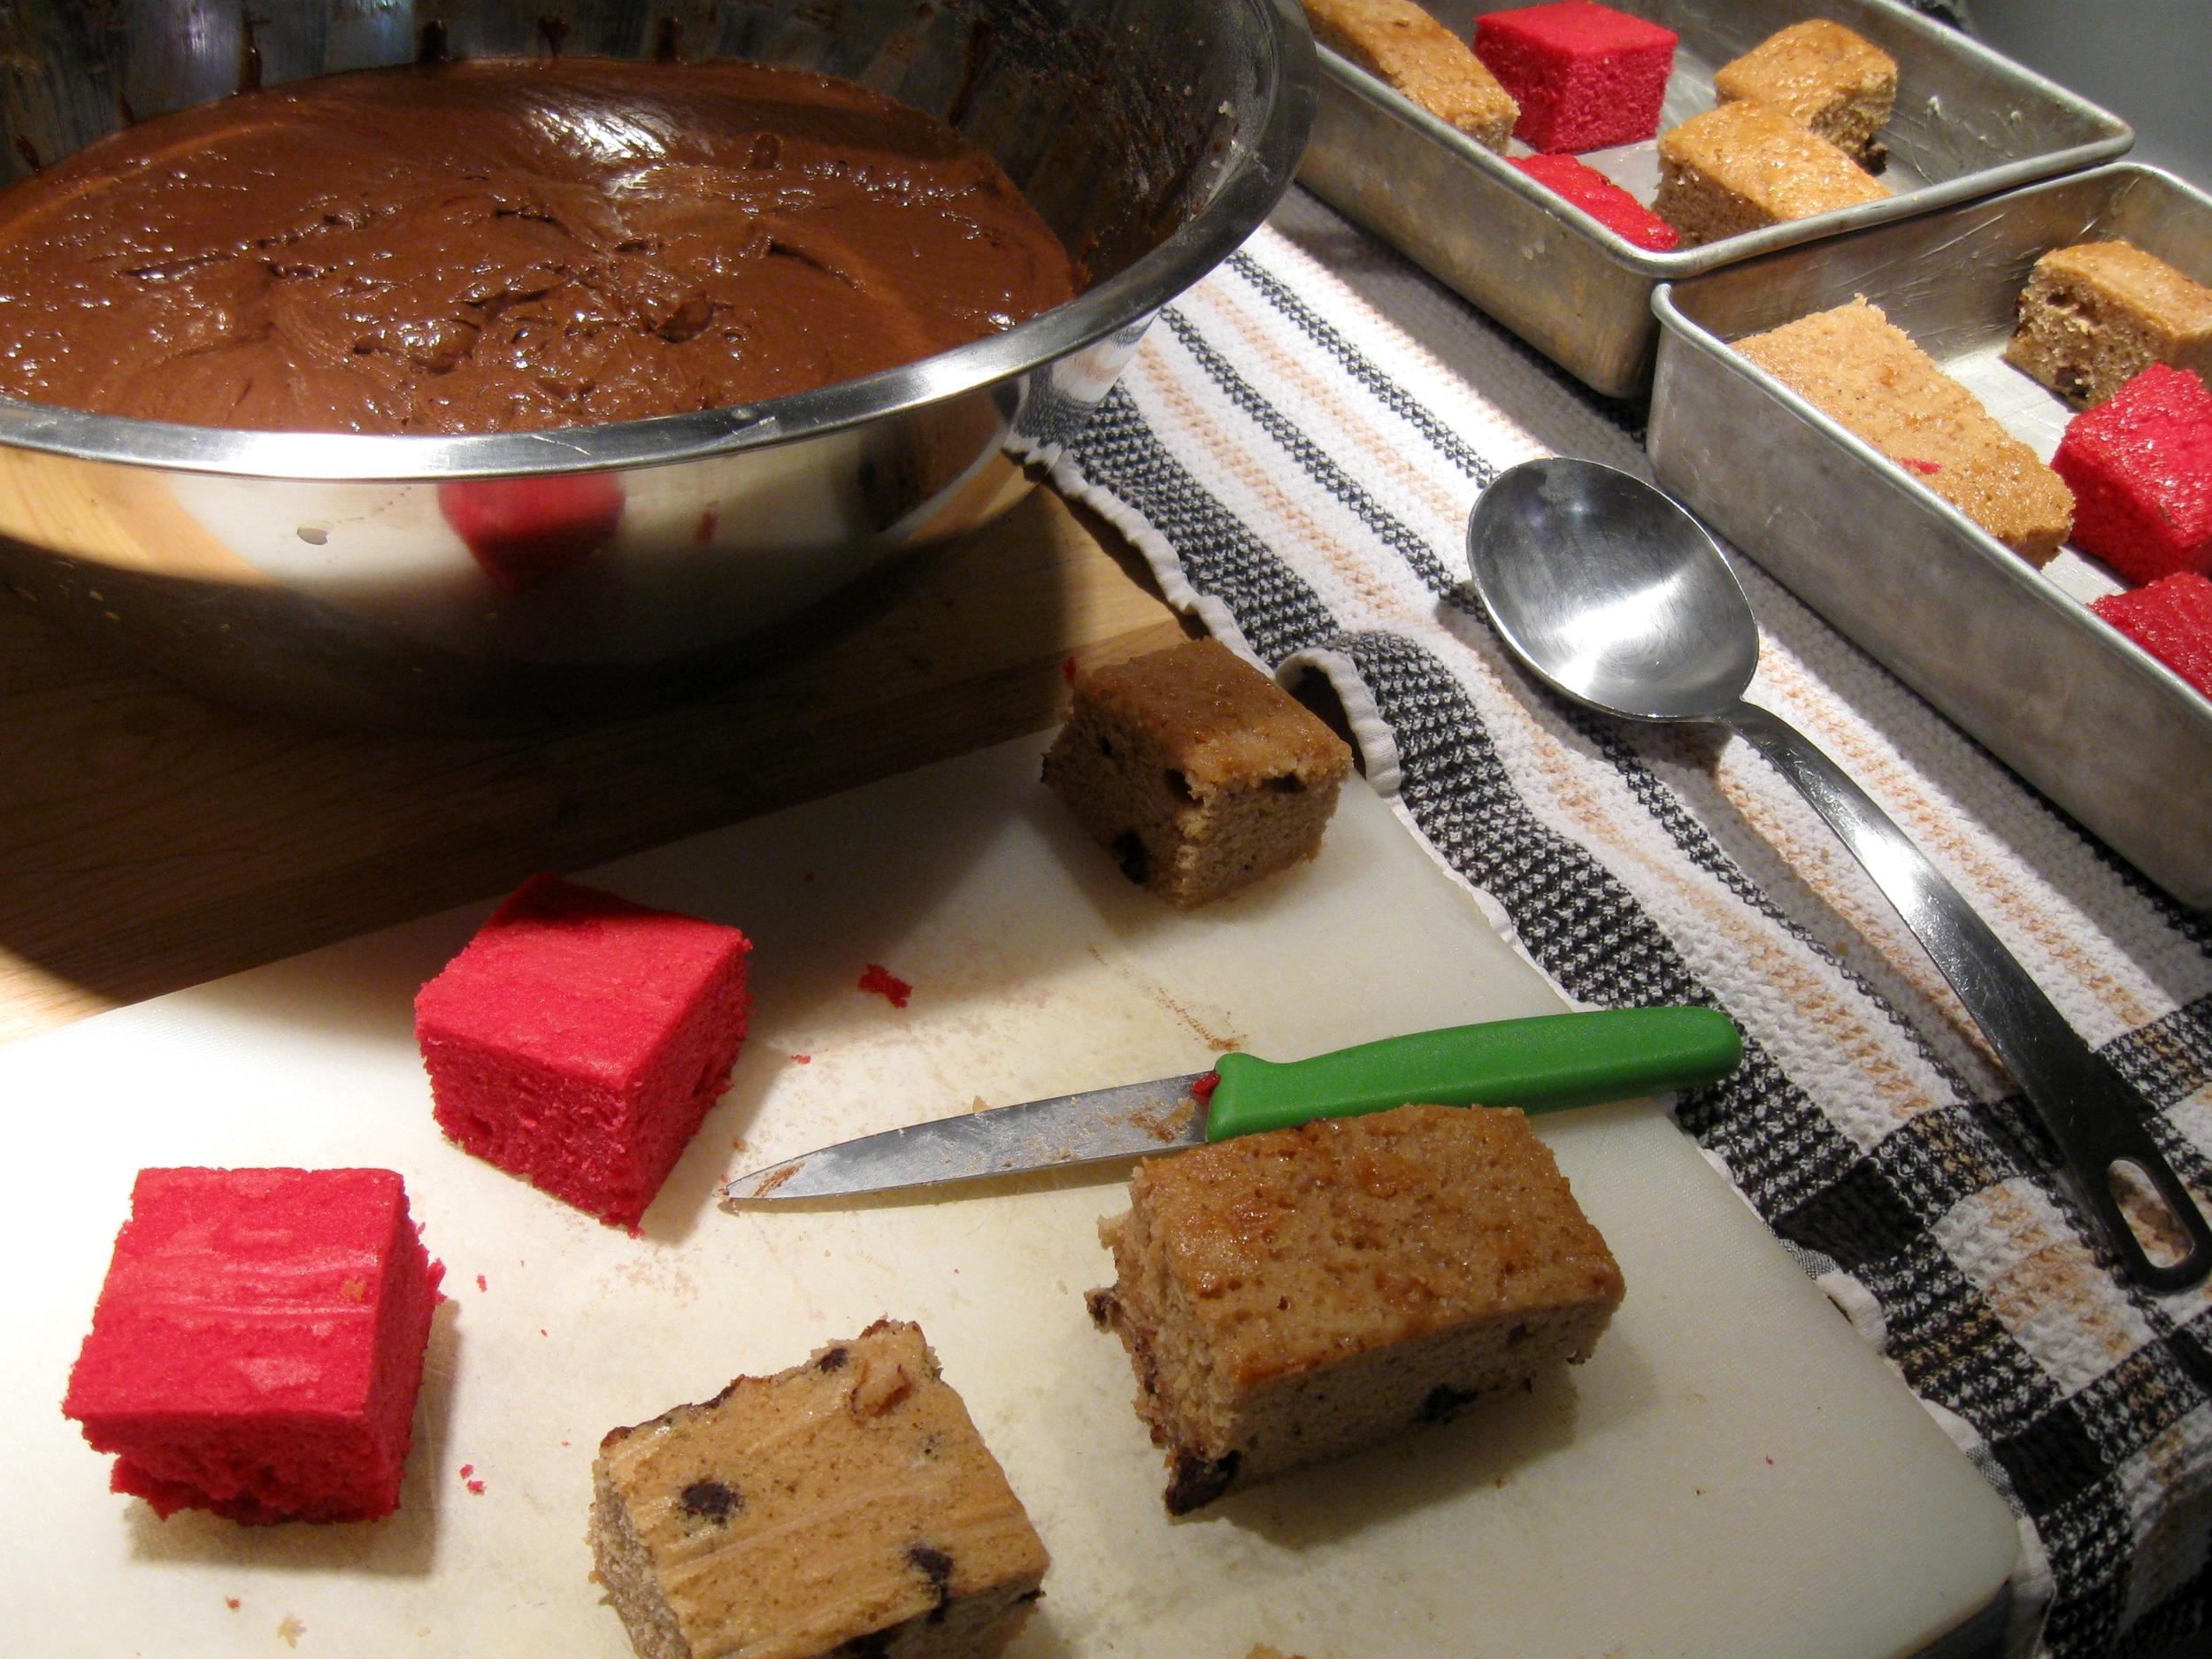 DIY: Minecraft Terrain Block Cake